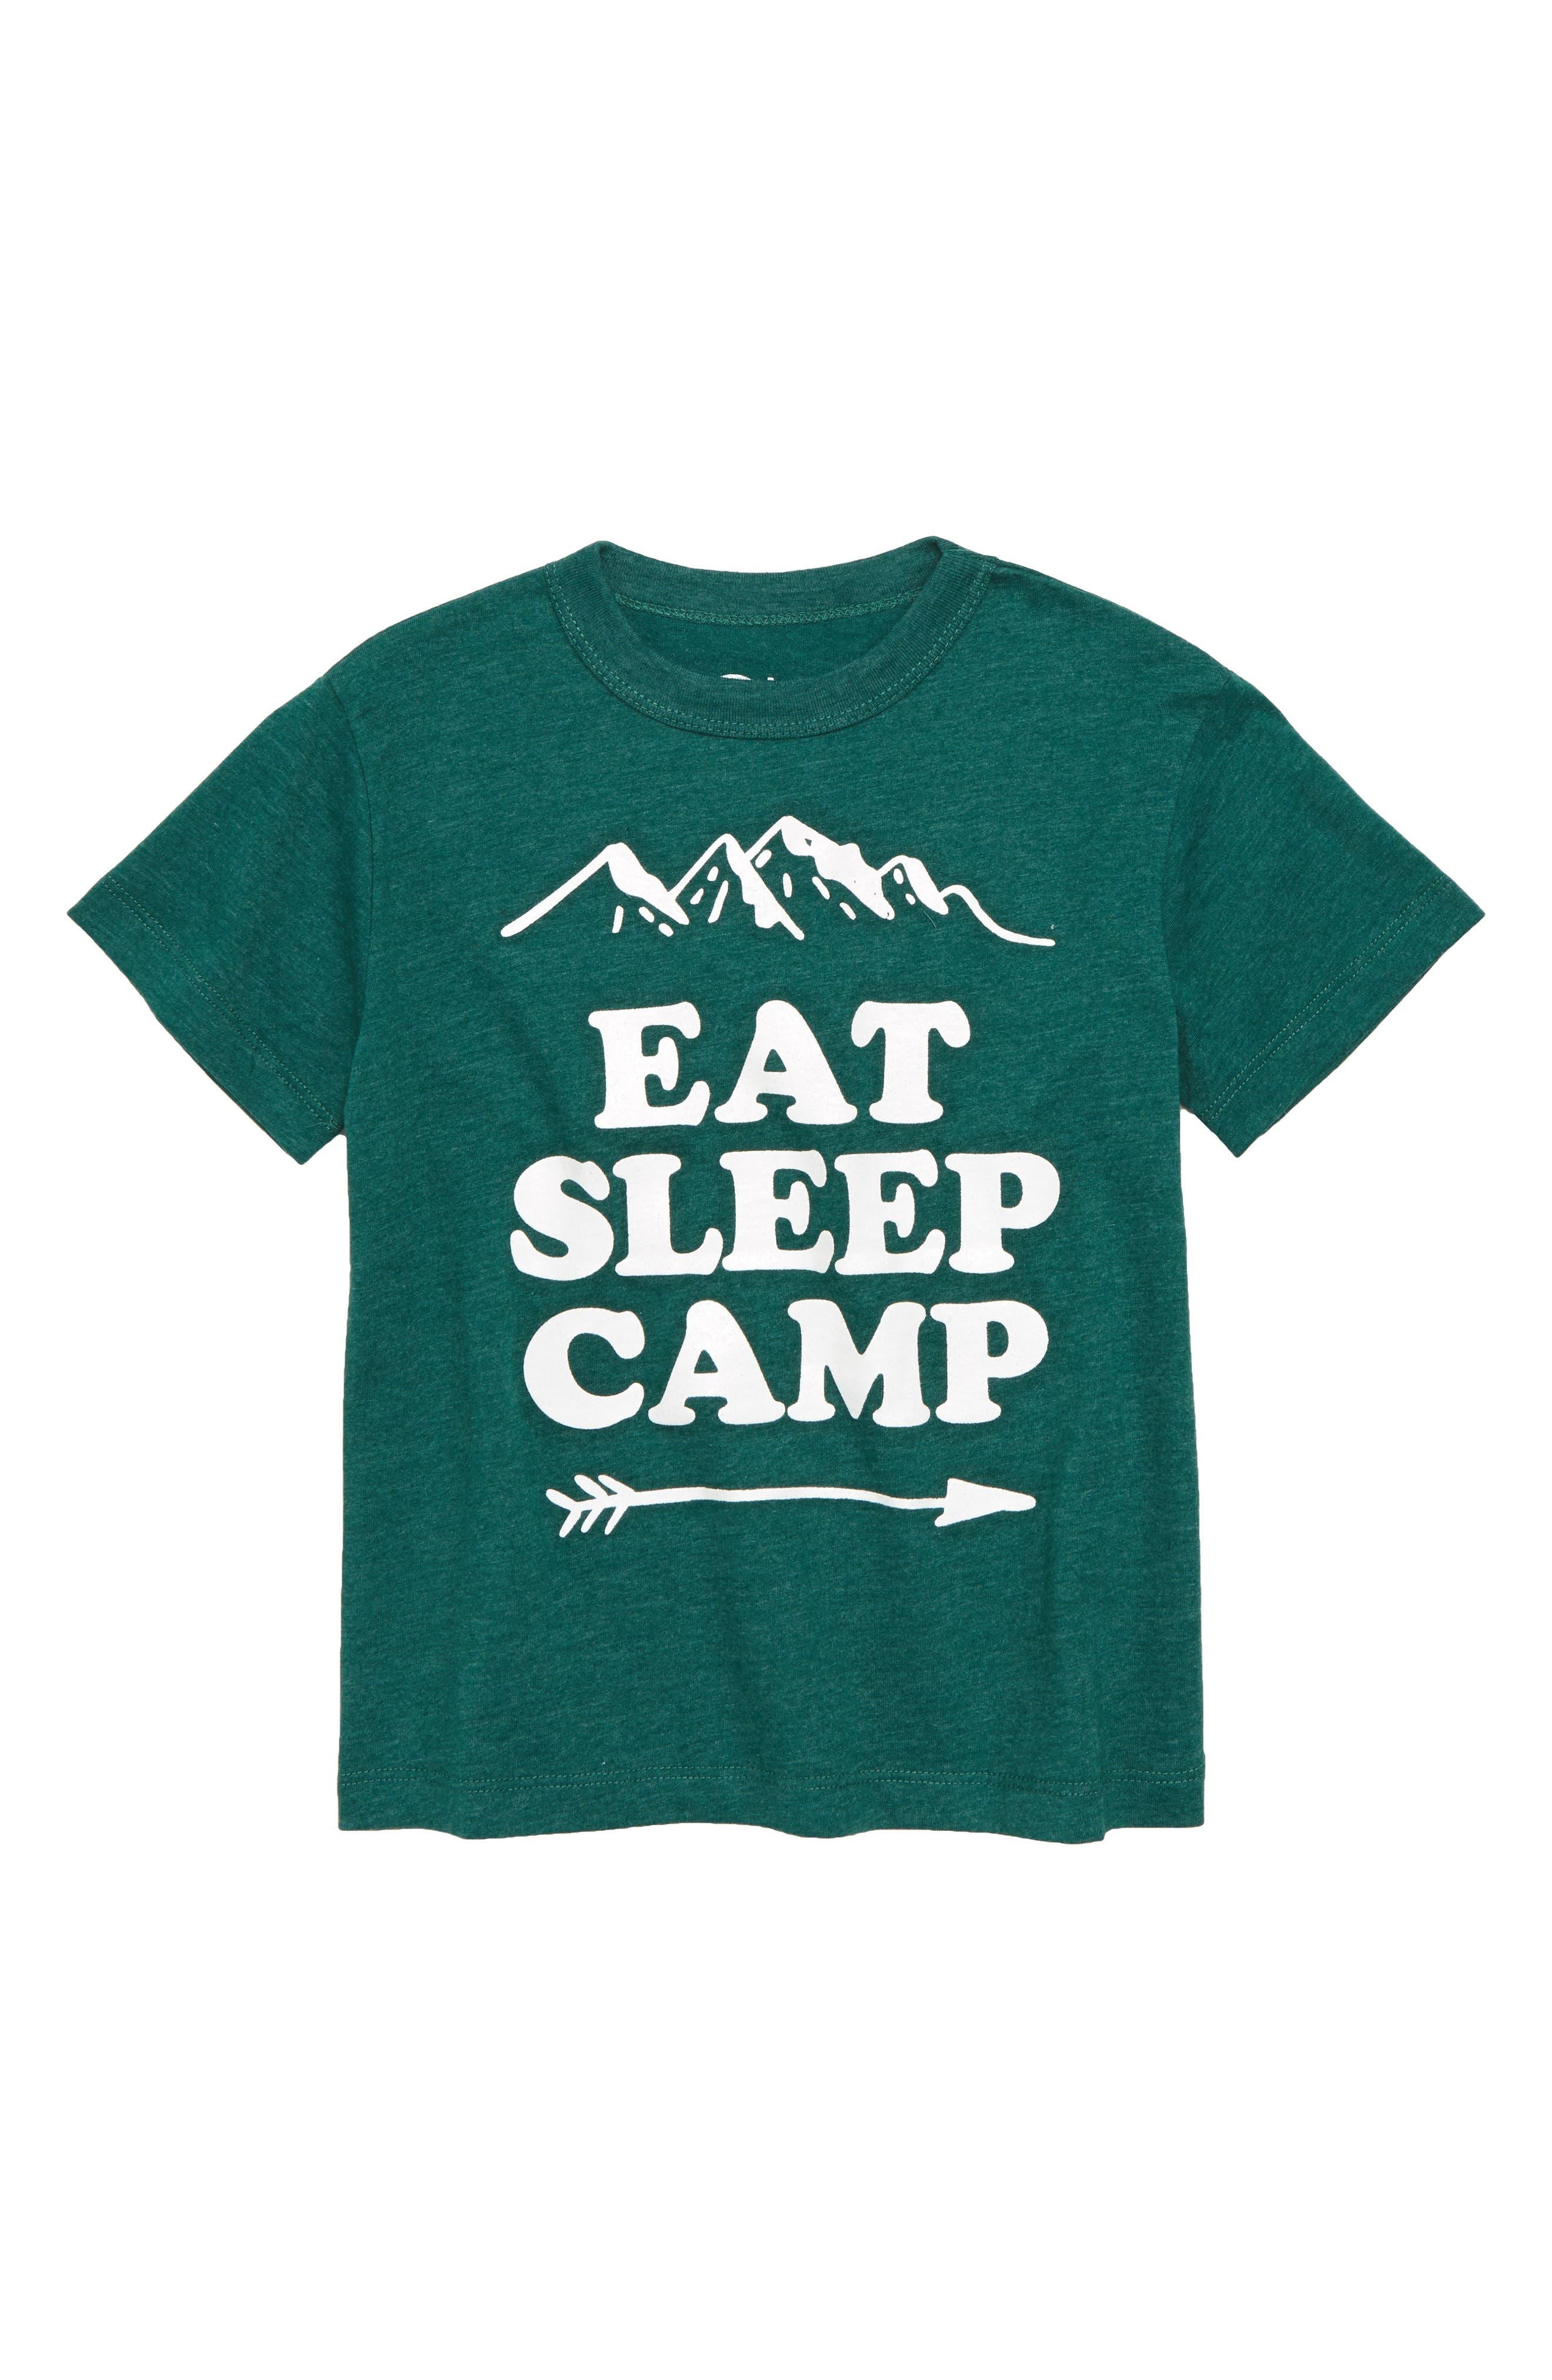 Eat Sleep Camp Graphic T-Shirt,                             Main thumbnail 1, color,                             307